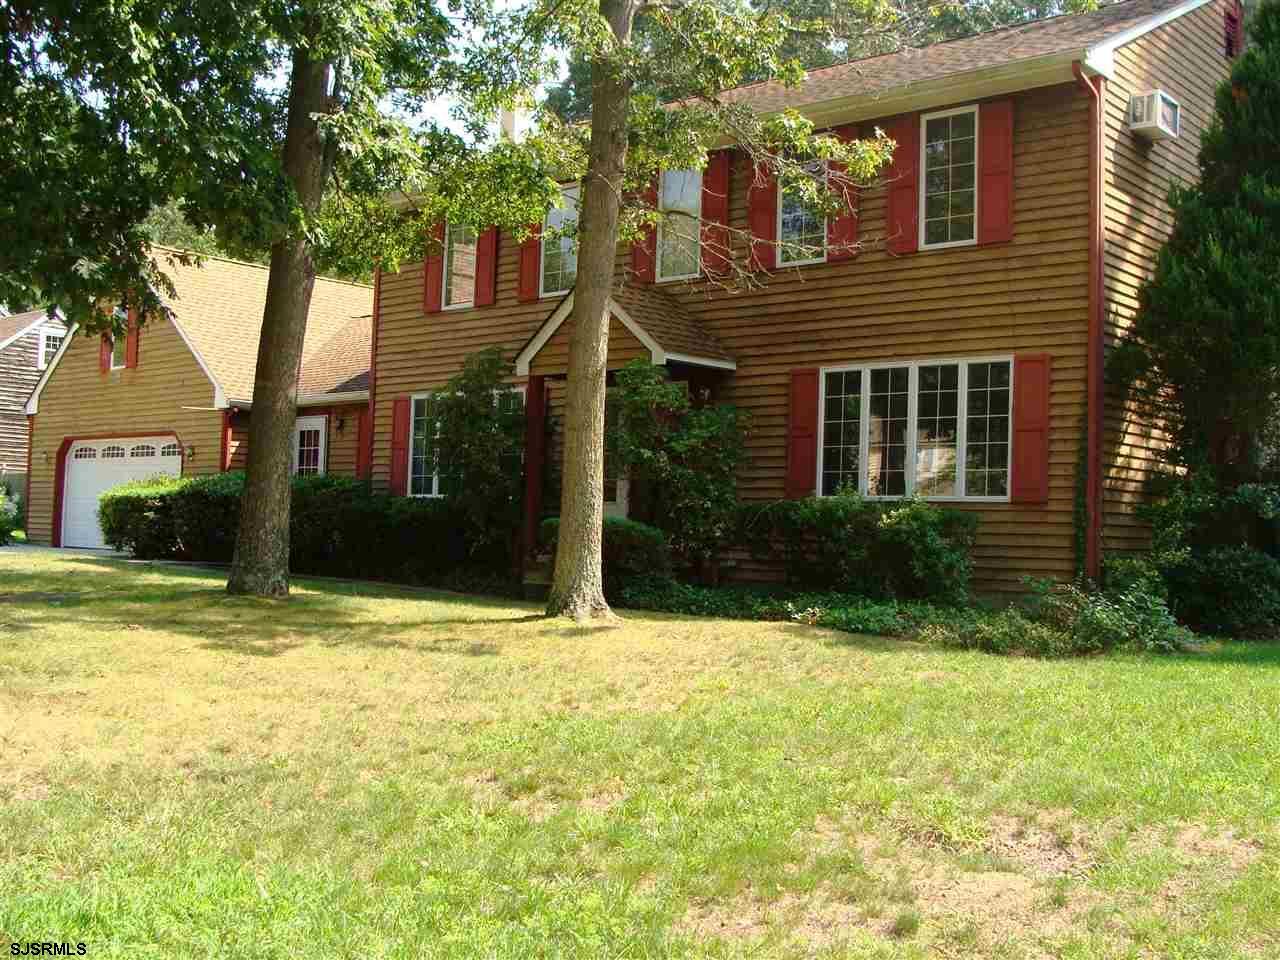 310 Dorchester Dr, Egg Harbor Township, NJ 08234